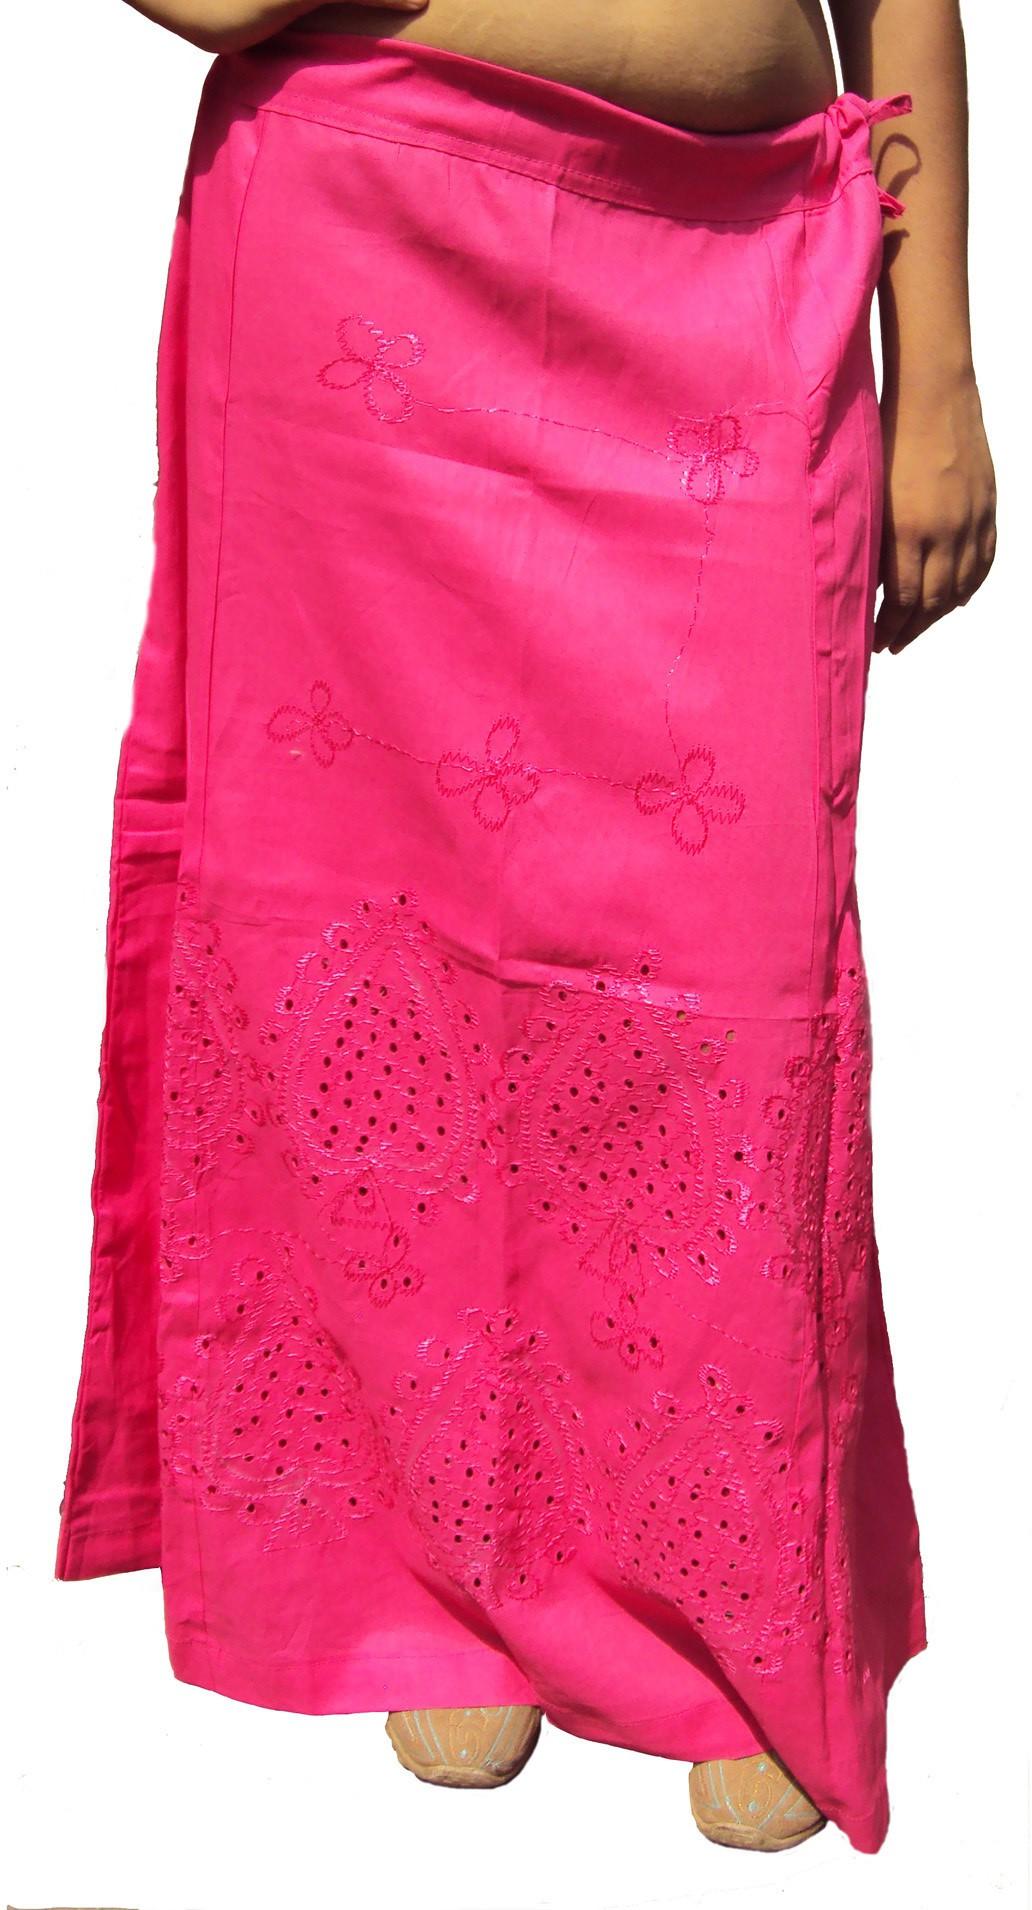 New Life Enterprise Hath0713-Deep pink Cotton Petticoat(XXL)